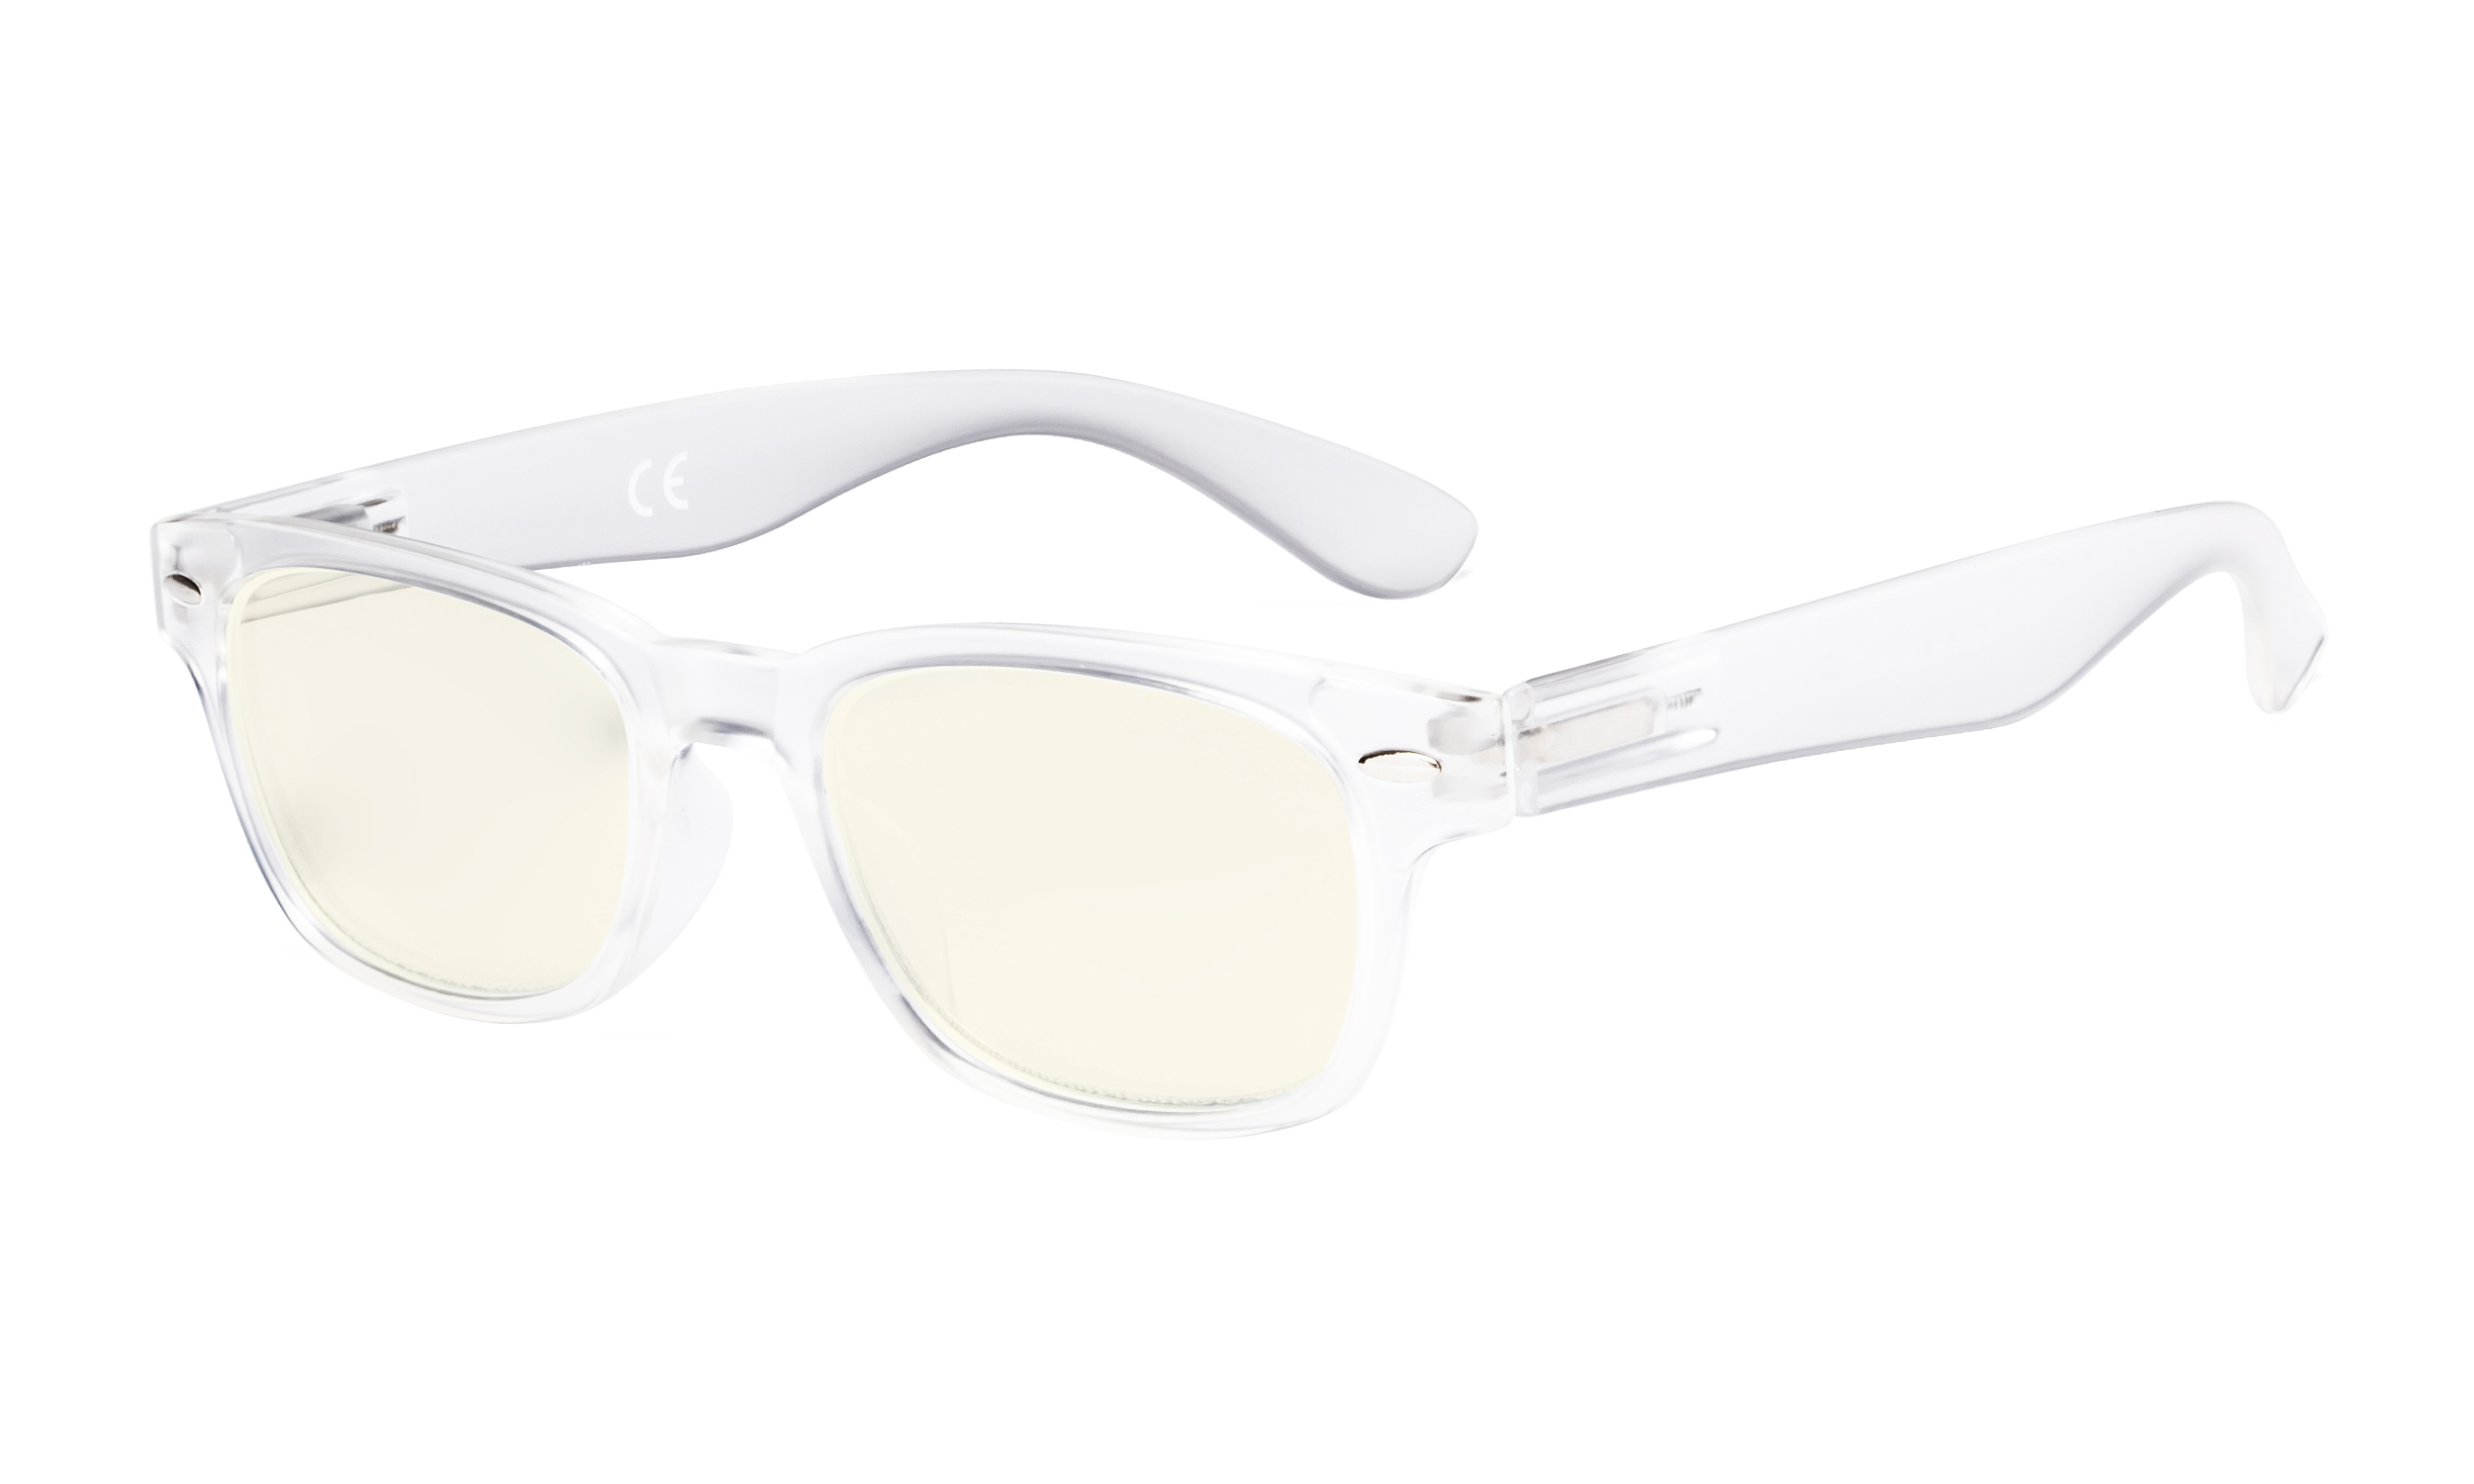 29efaa866f1e Eyekepper Ladies Computer Glasses - Blue Light Filter Readers Women - UV420 Protection  Retro Reading Eyeglasses - Clear UVRFH4